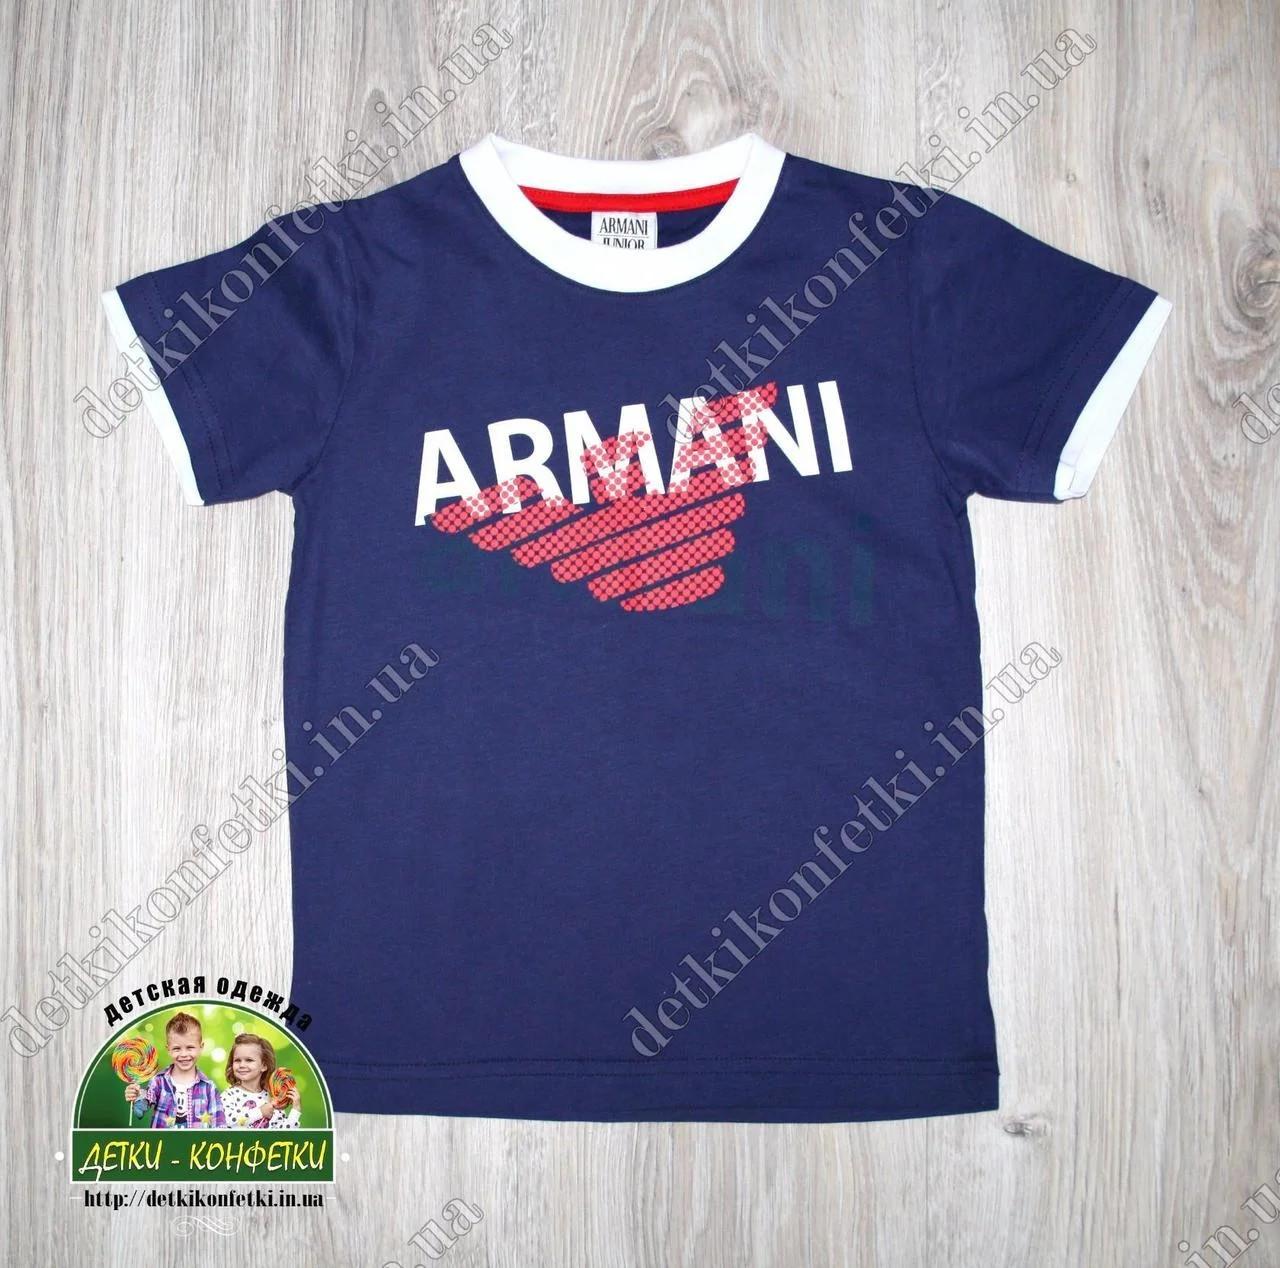 Купить Брендовая футболка для мальчика Армани Armani